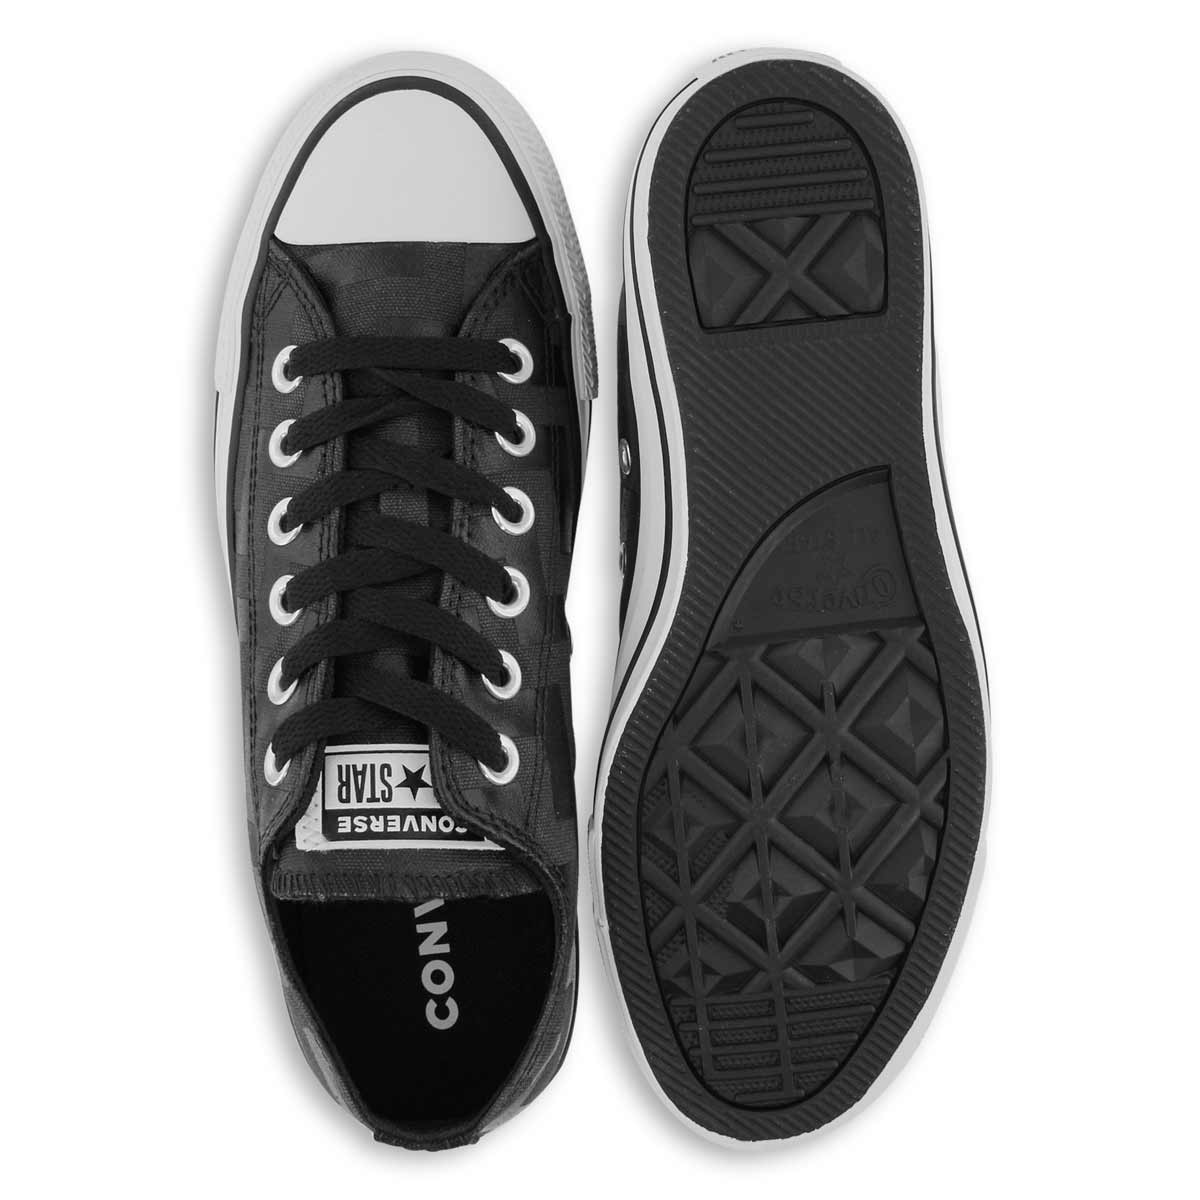 Women's CTAS GLAM DUNK black/black sneaker